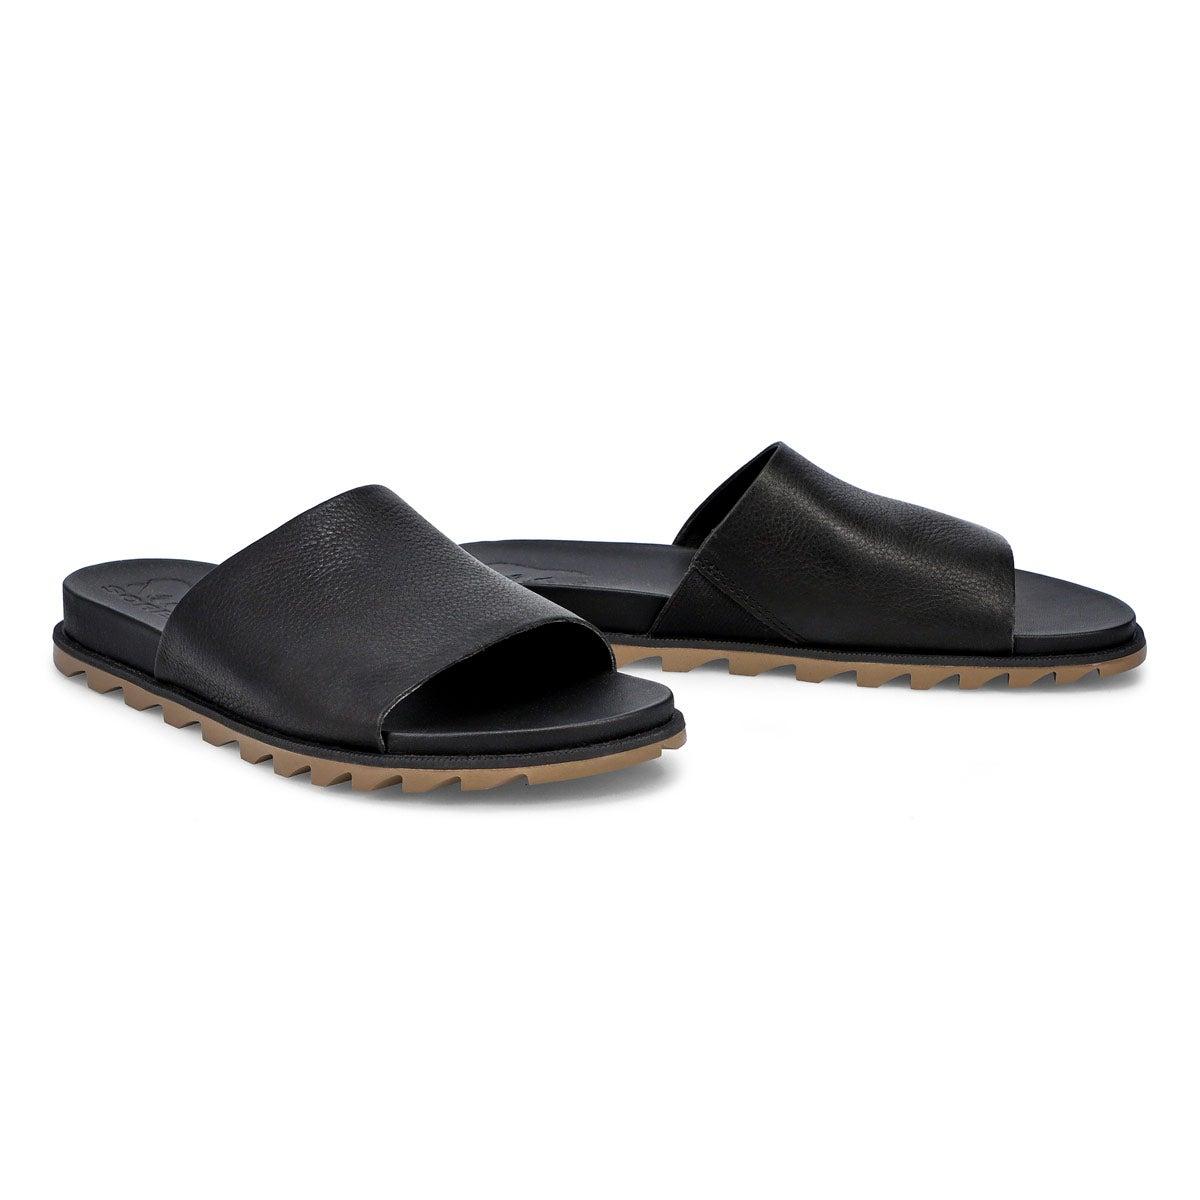 Womens' Roaming Decon Sandal - Black